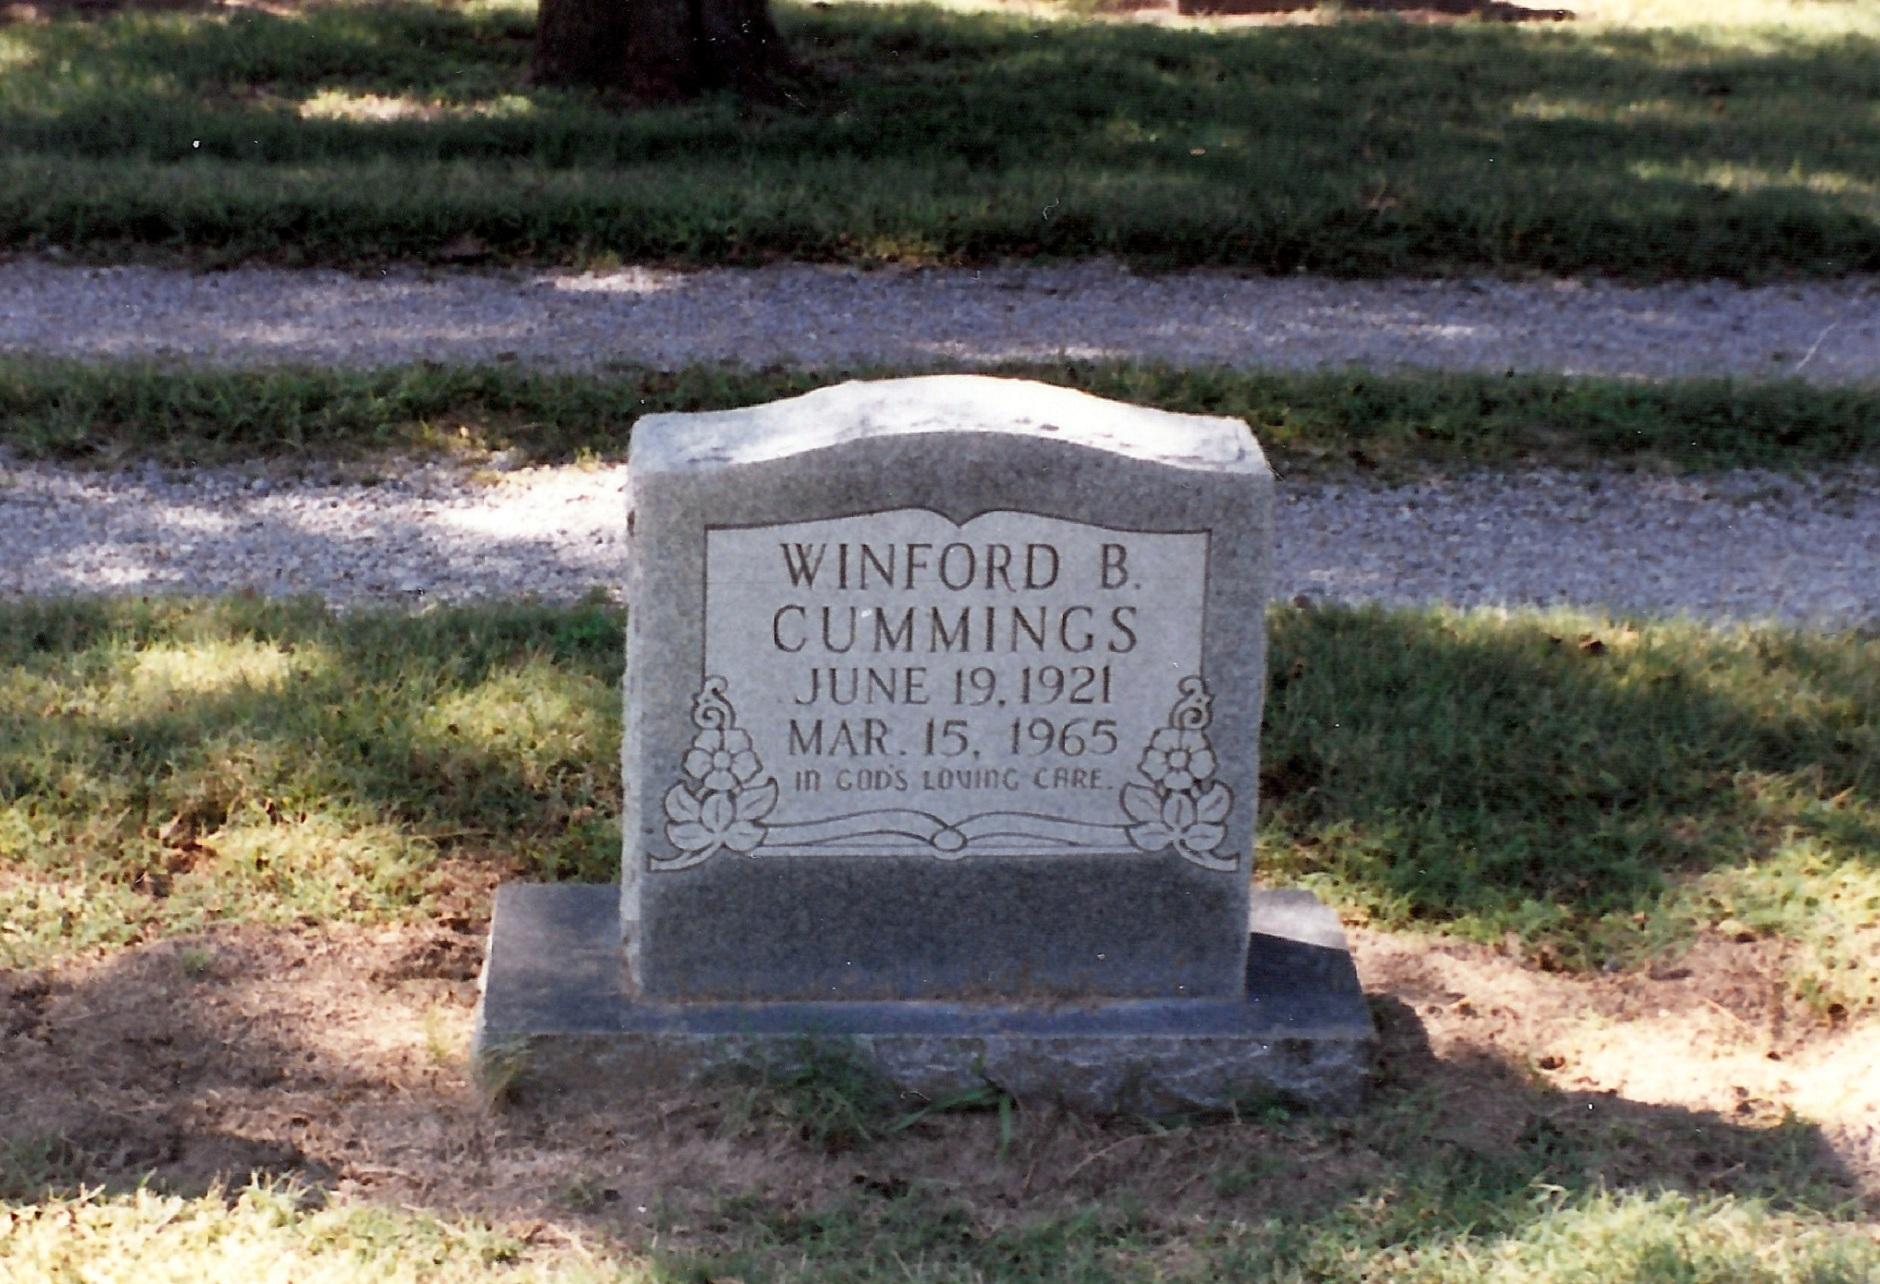 Winford B. Cummings